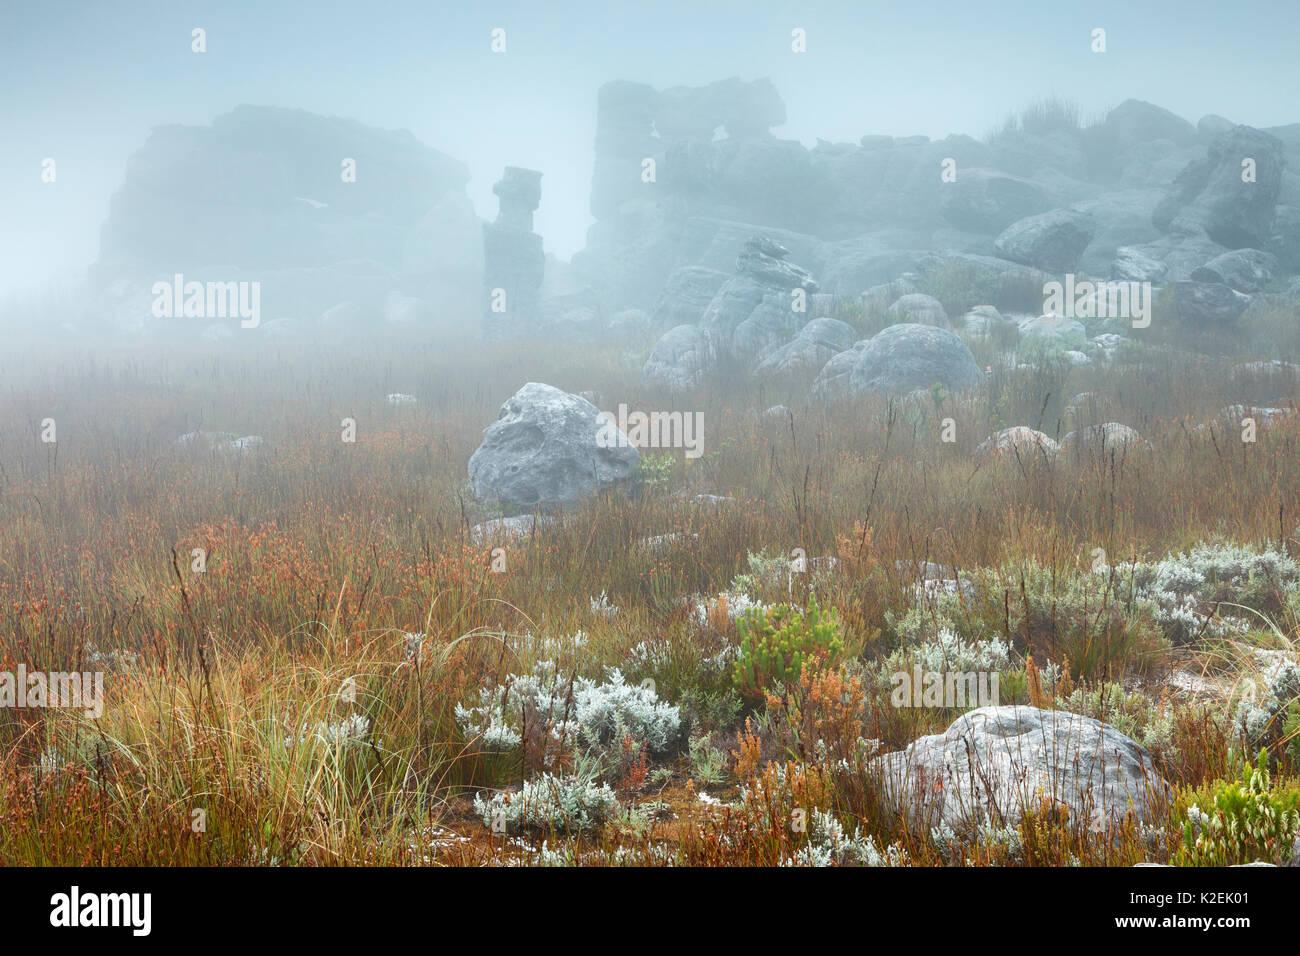 Felsen und Vegetation im Nebel im Morgengrauen, Hottentots Holland Berge, Western Cape, Südafrika, Dezember 2014. Stockfoto